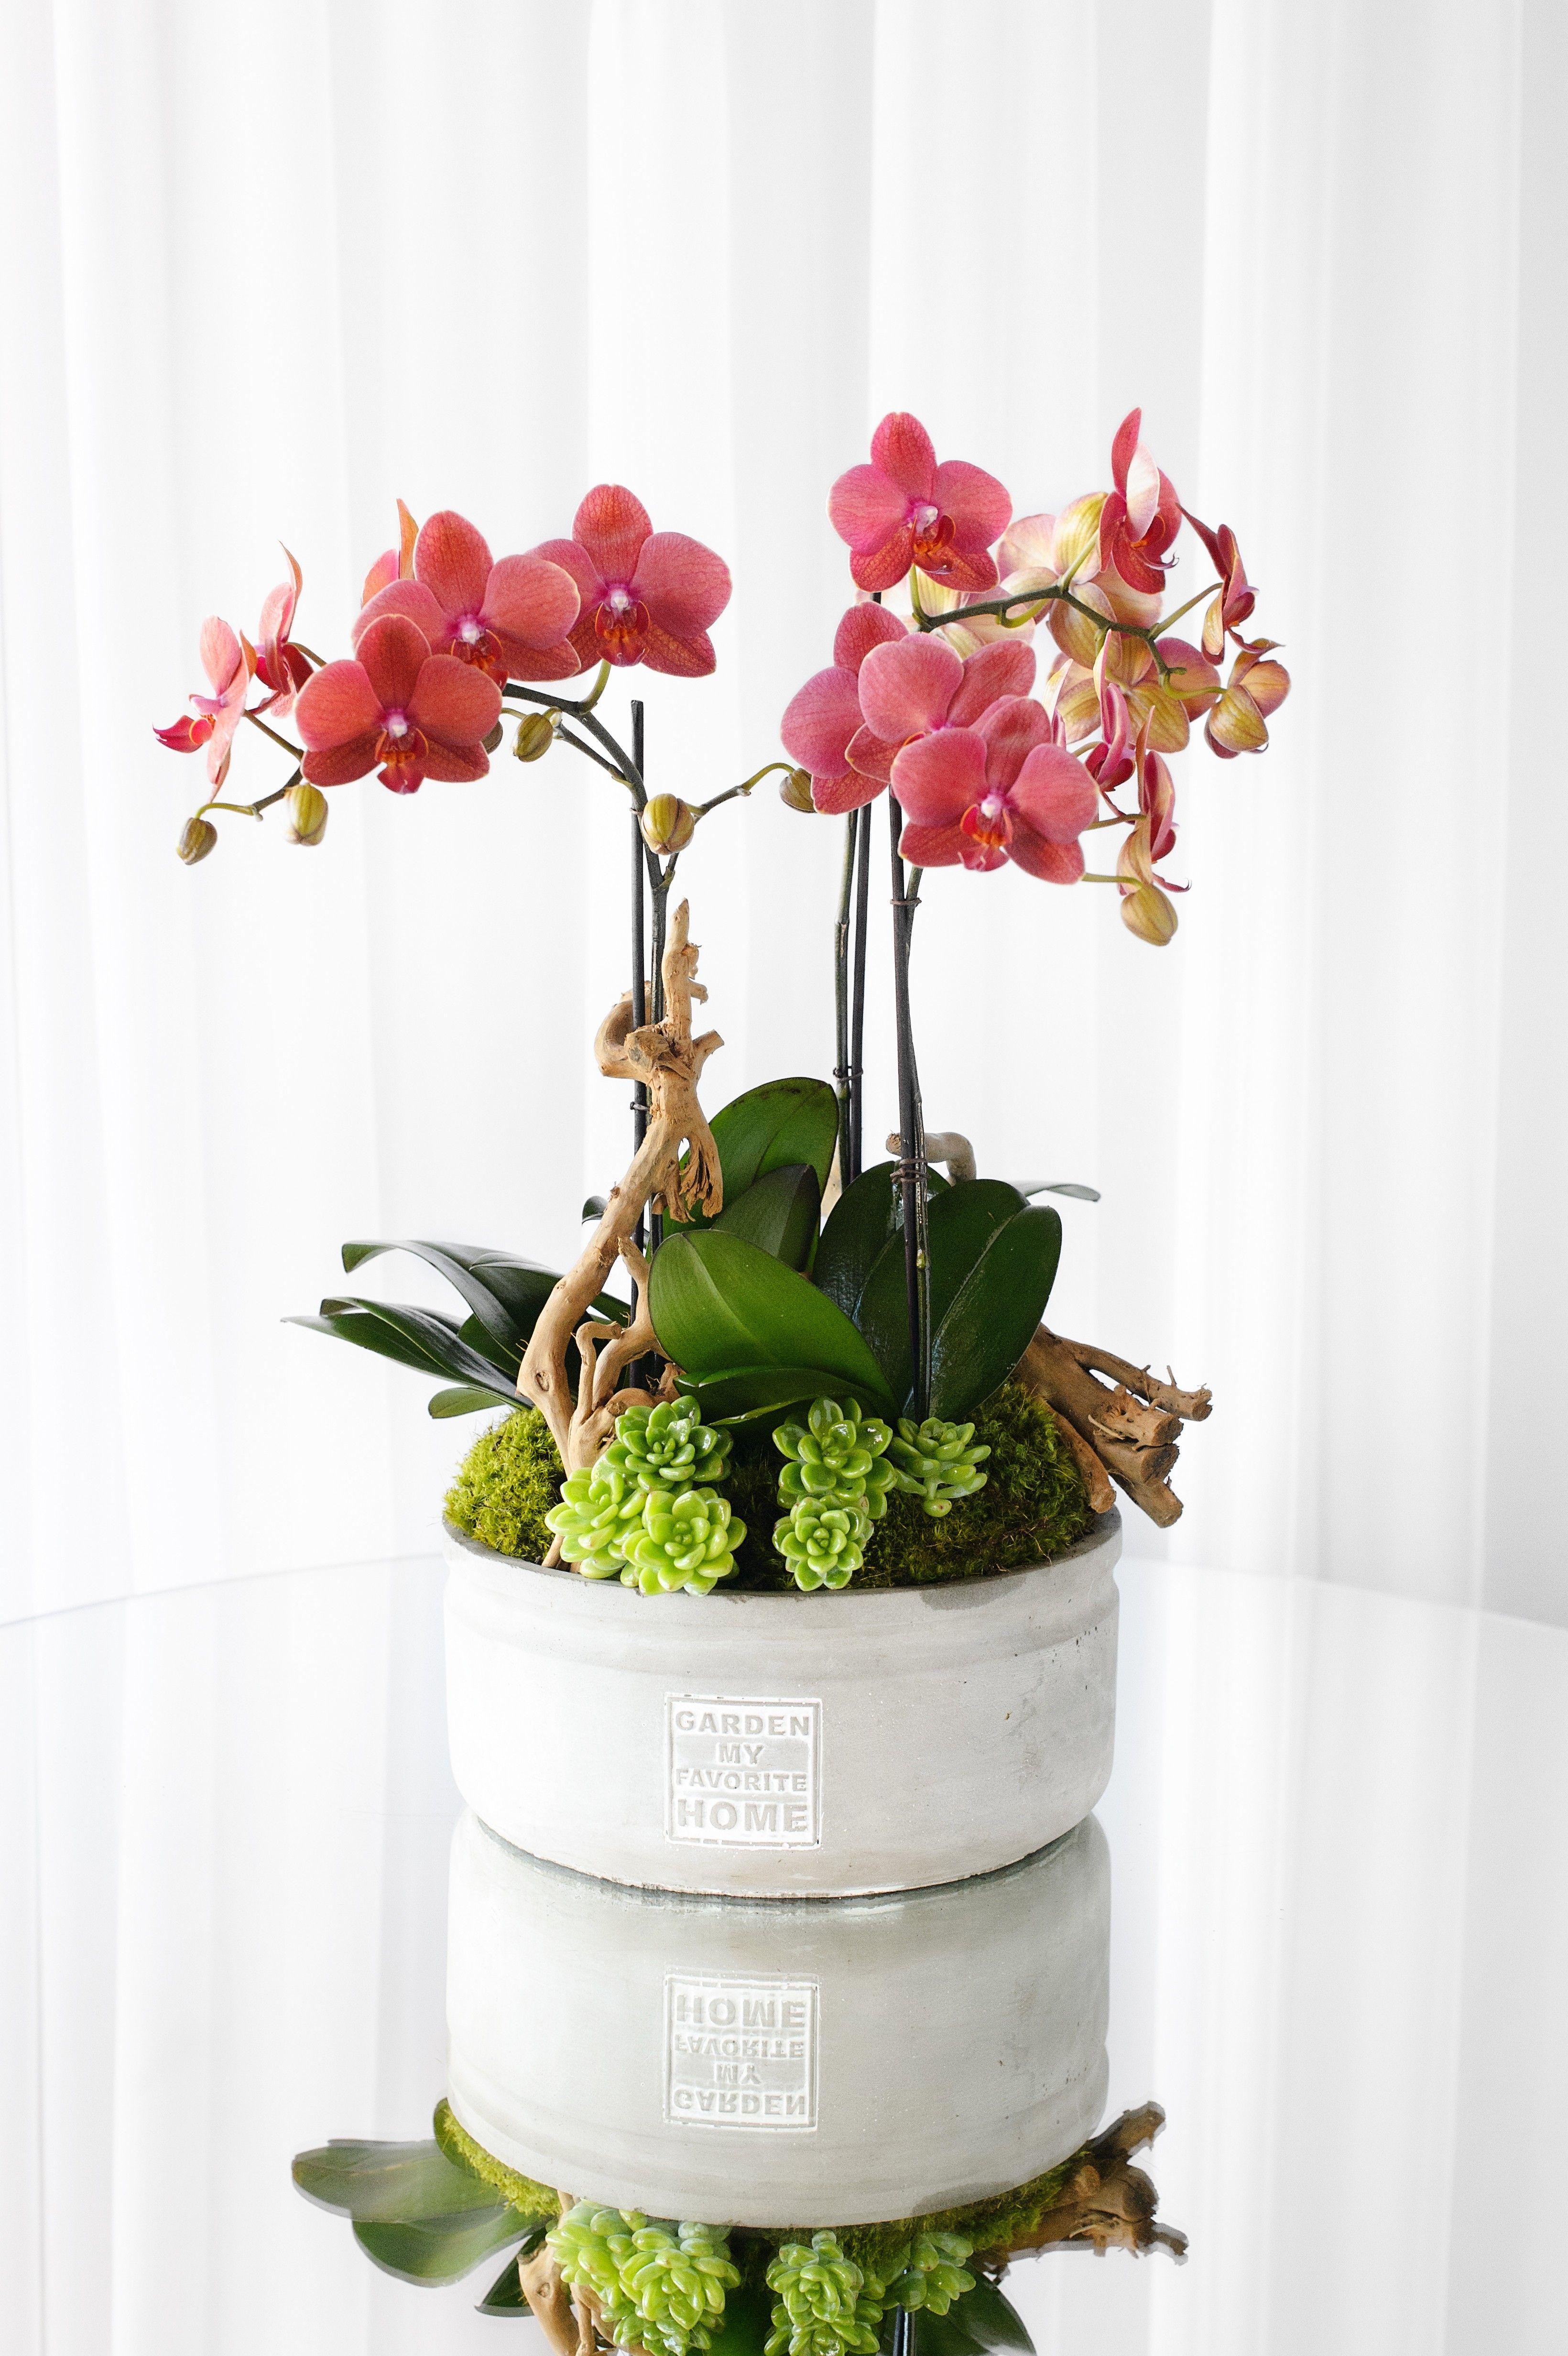 Spring Orchid in Los Angeles, CA The Hidden Garden